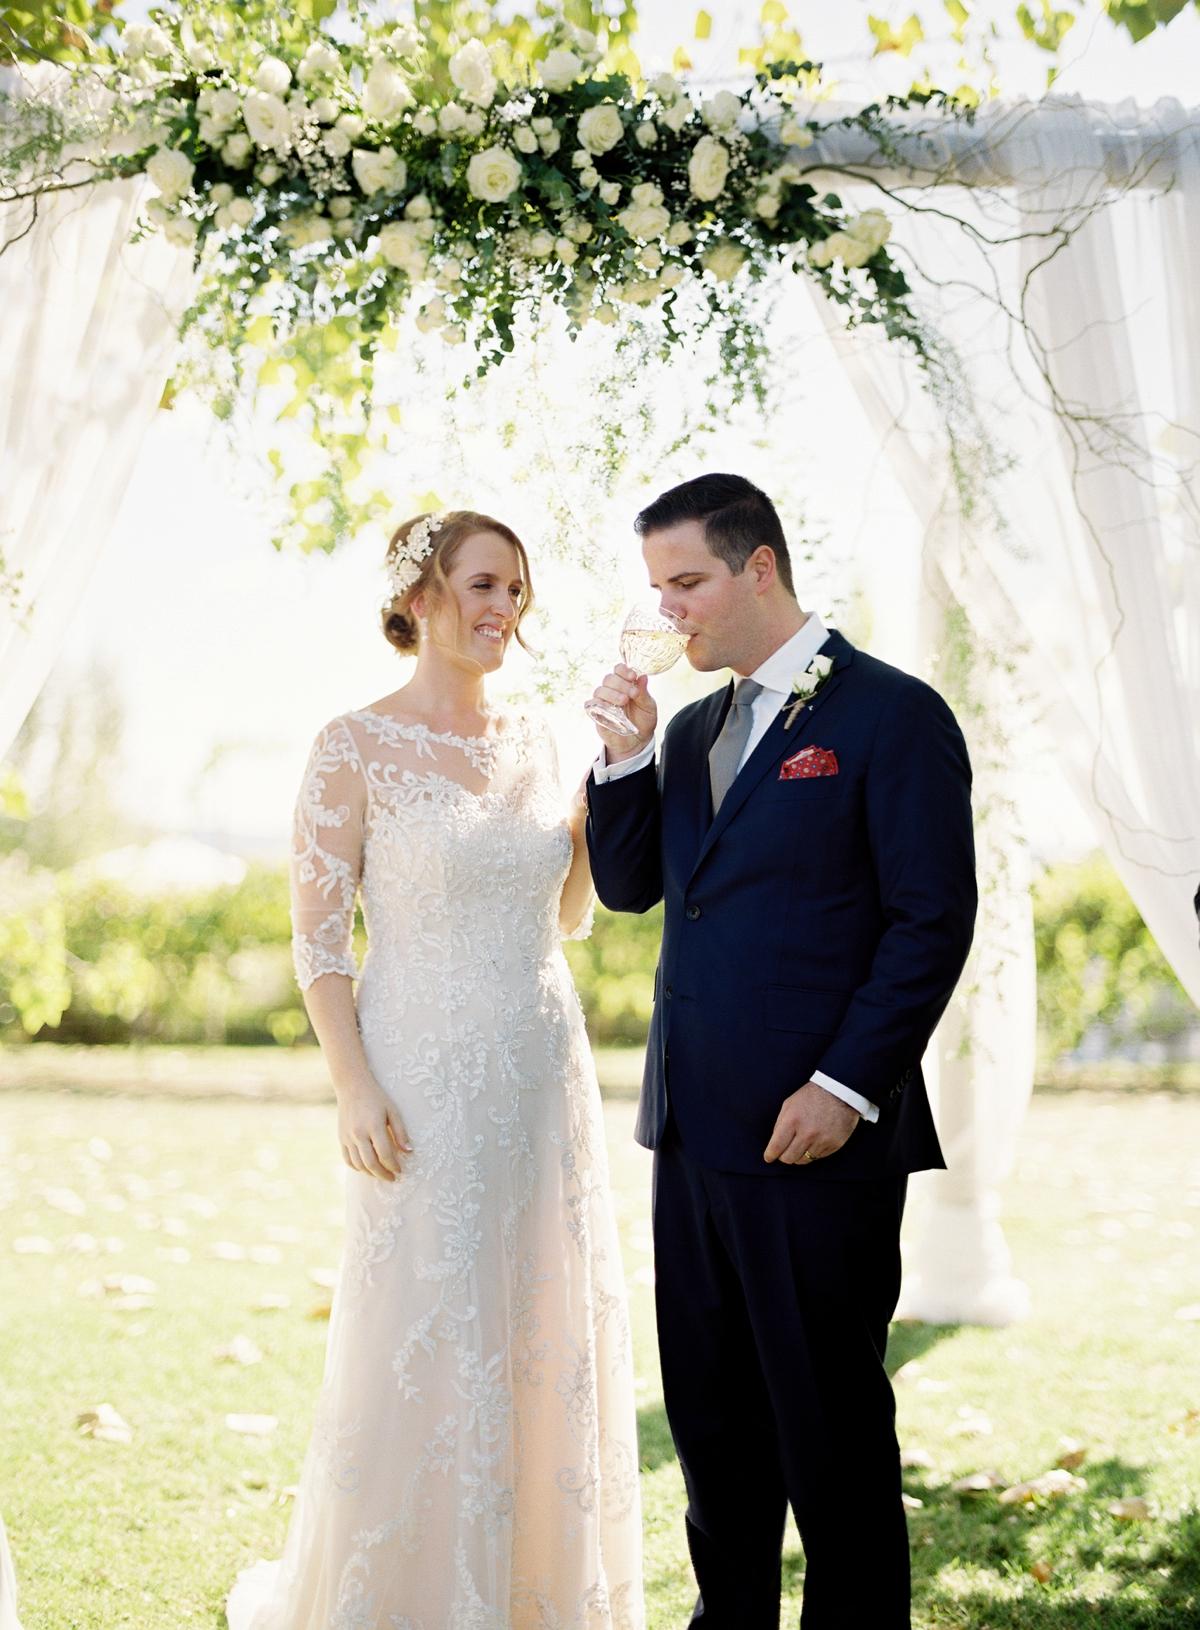 The Vine Grove Mudgee Wedding, Photography by Mr Edwards_1771.jpg